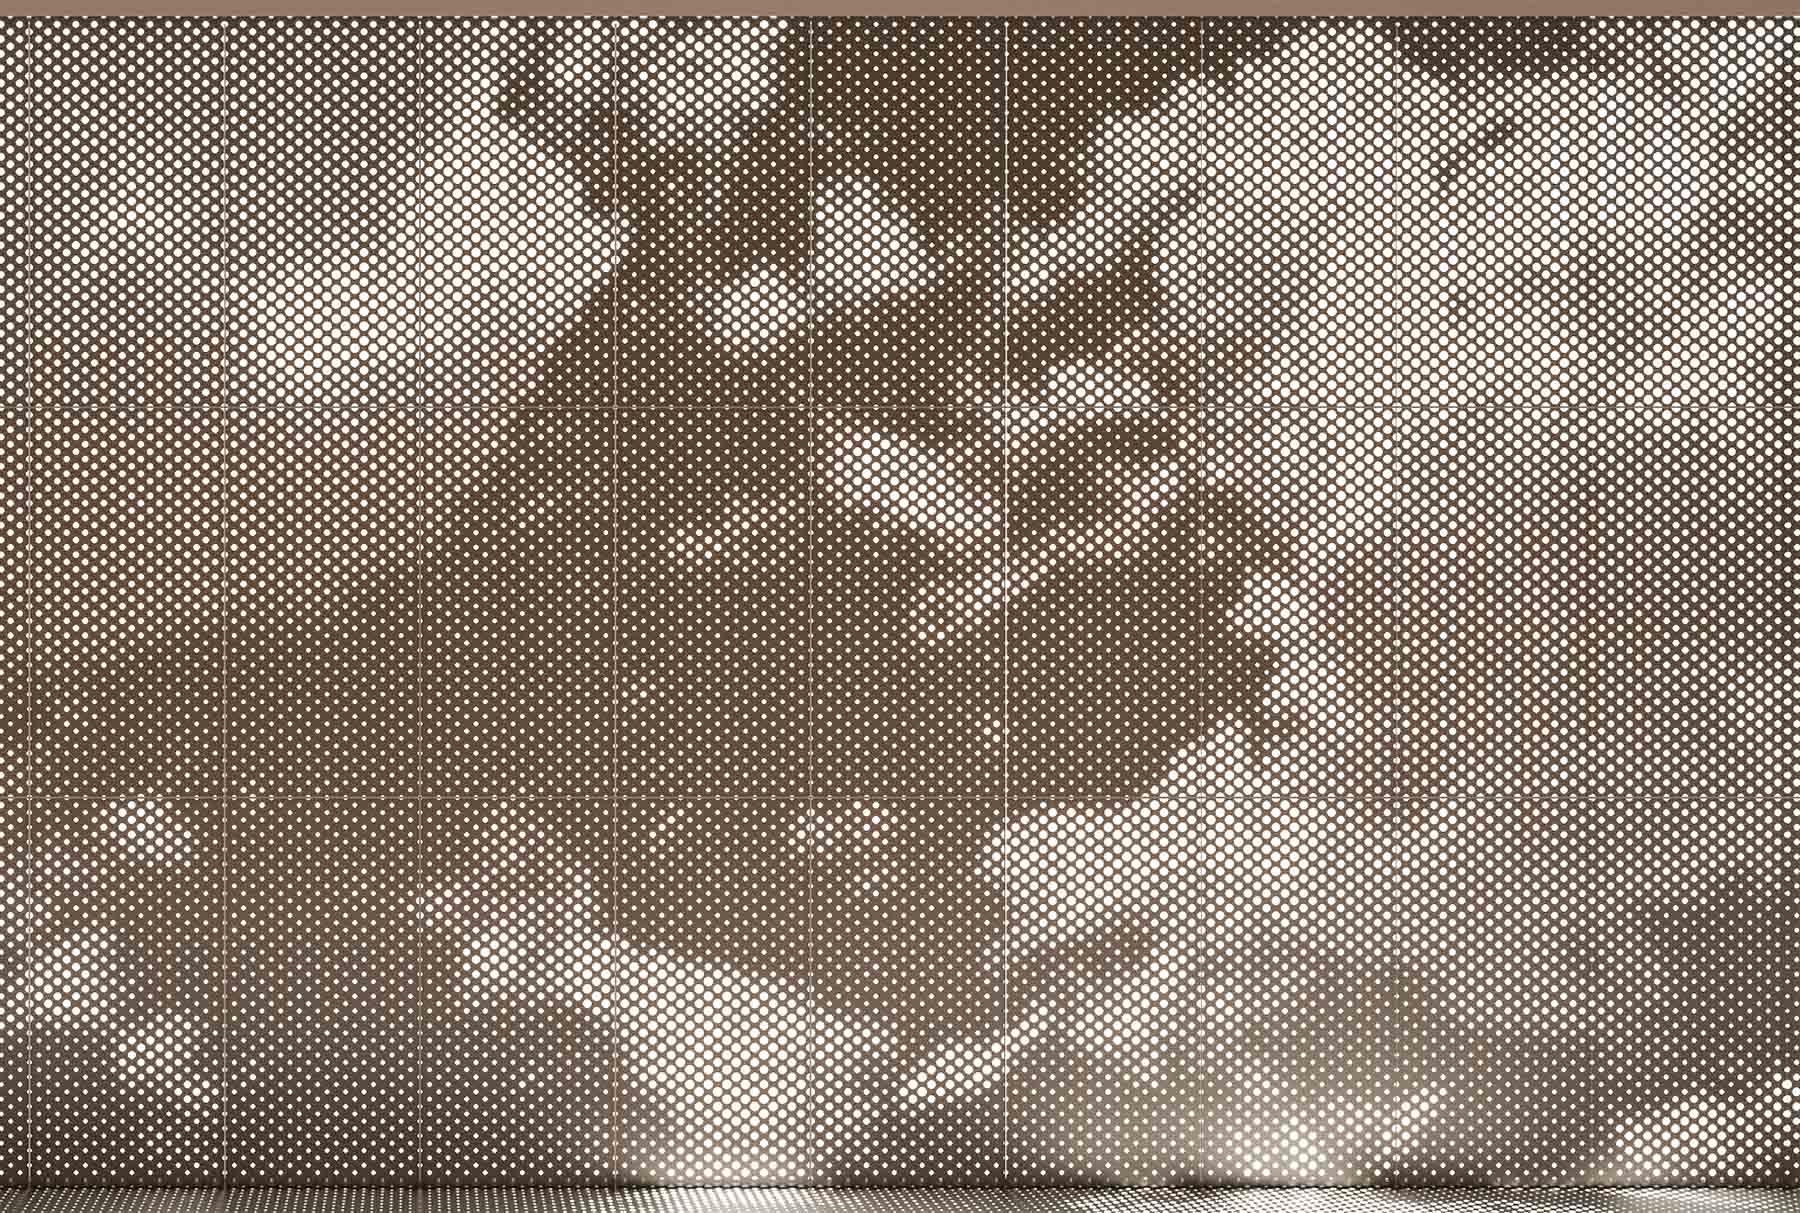 Arktura-Vapor-Graphic-Perf-Elevator-Lobby-Web-4